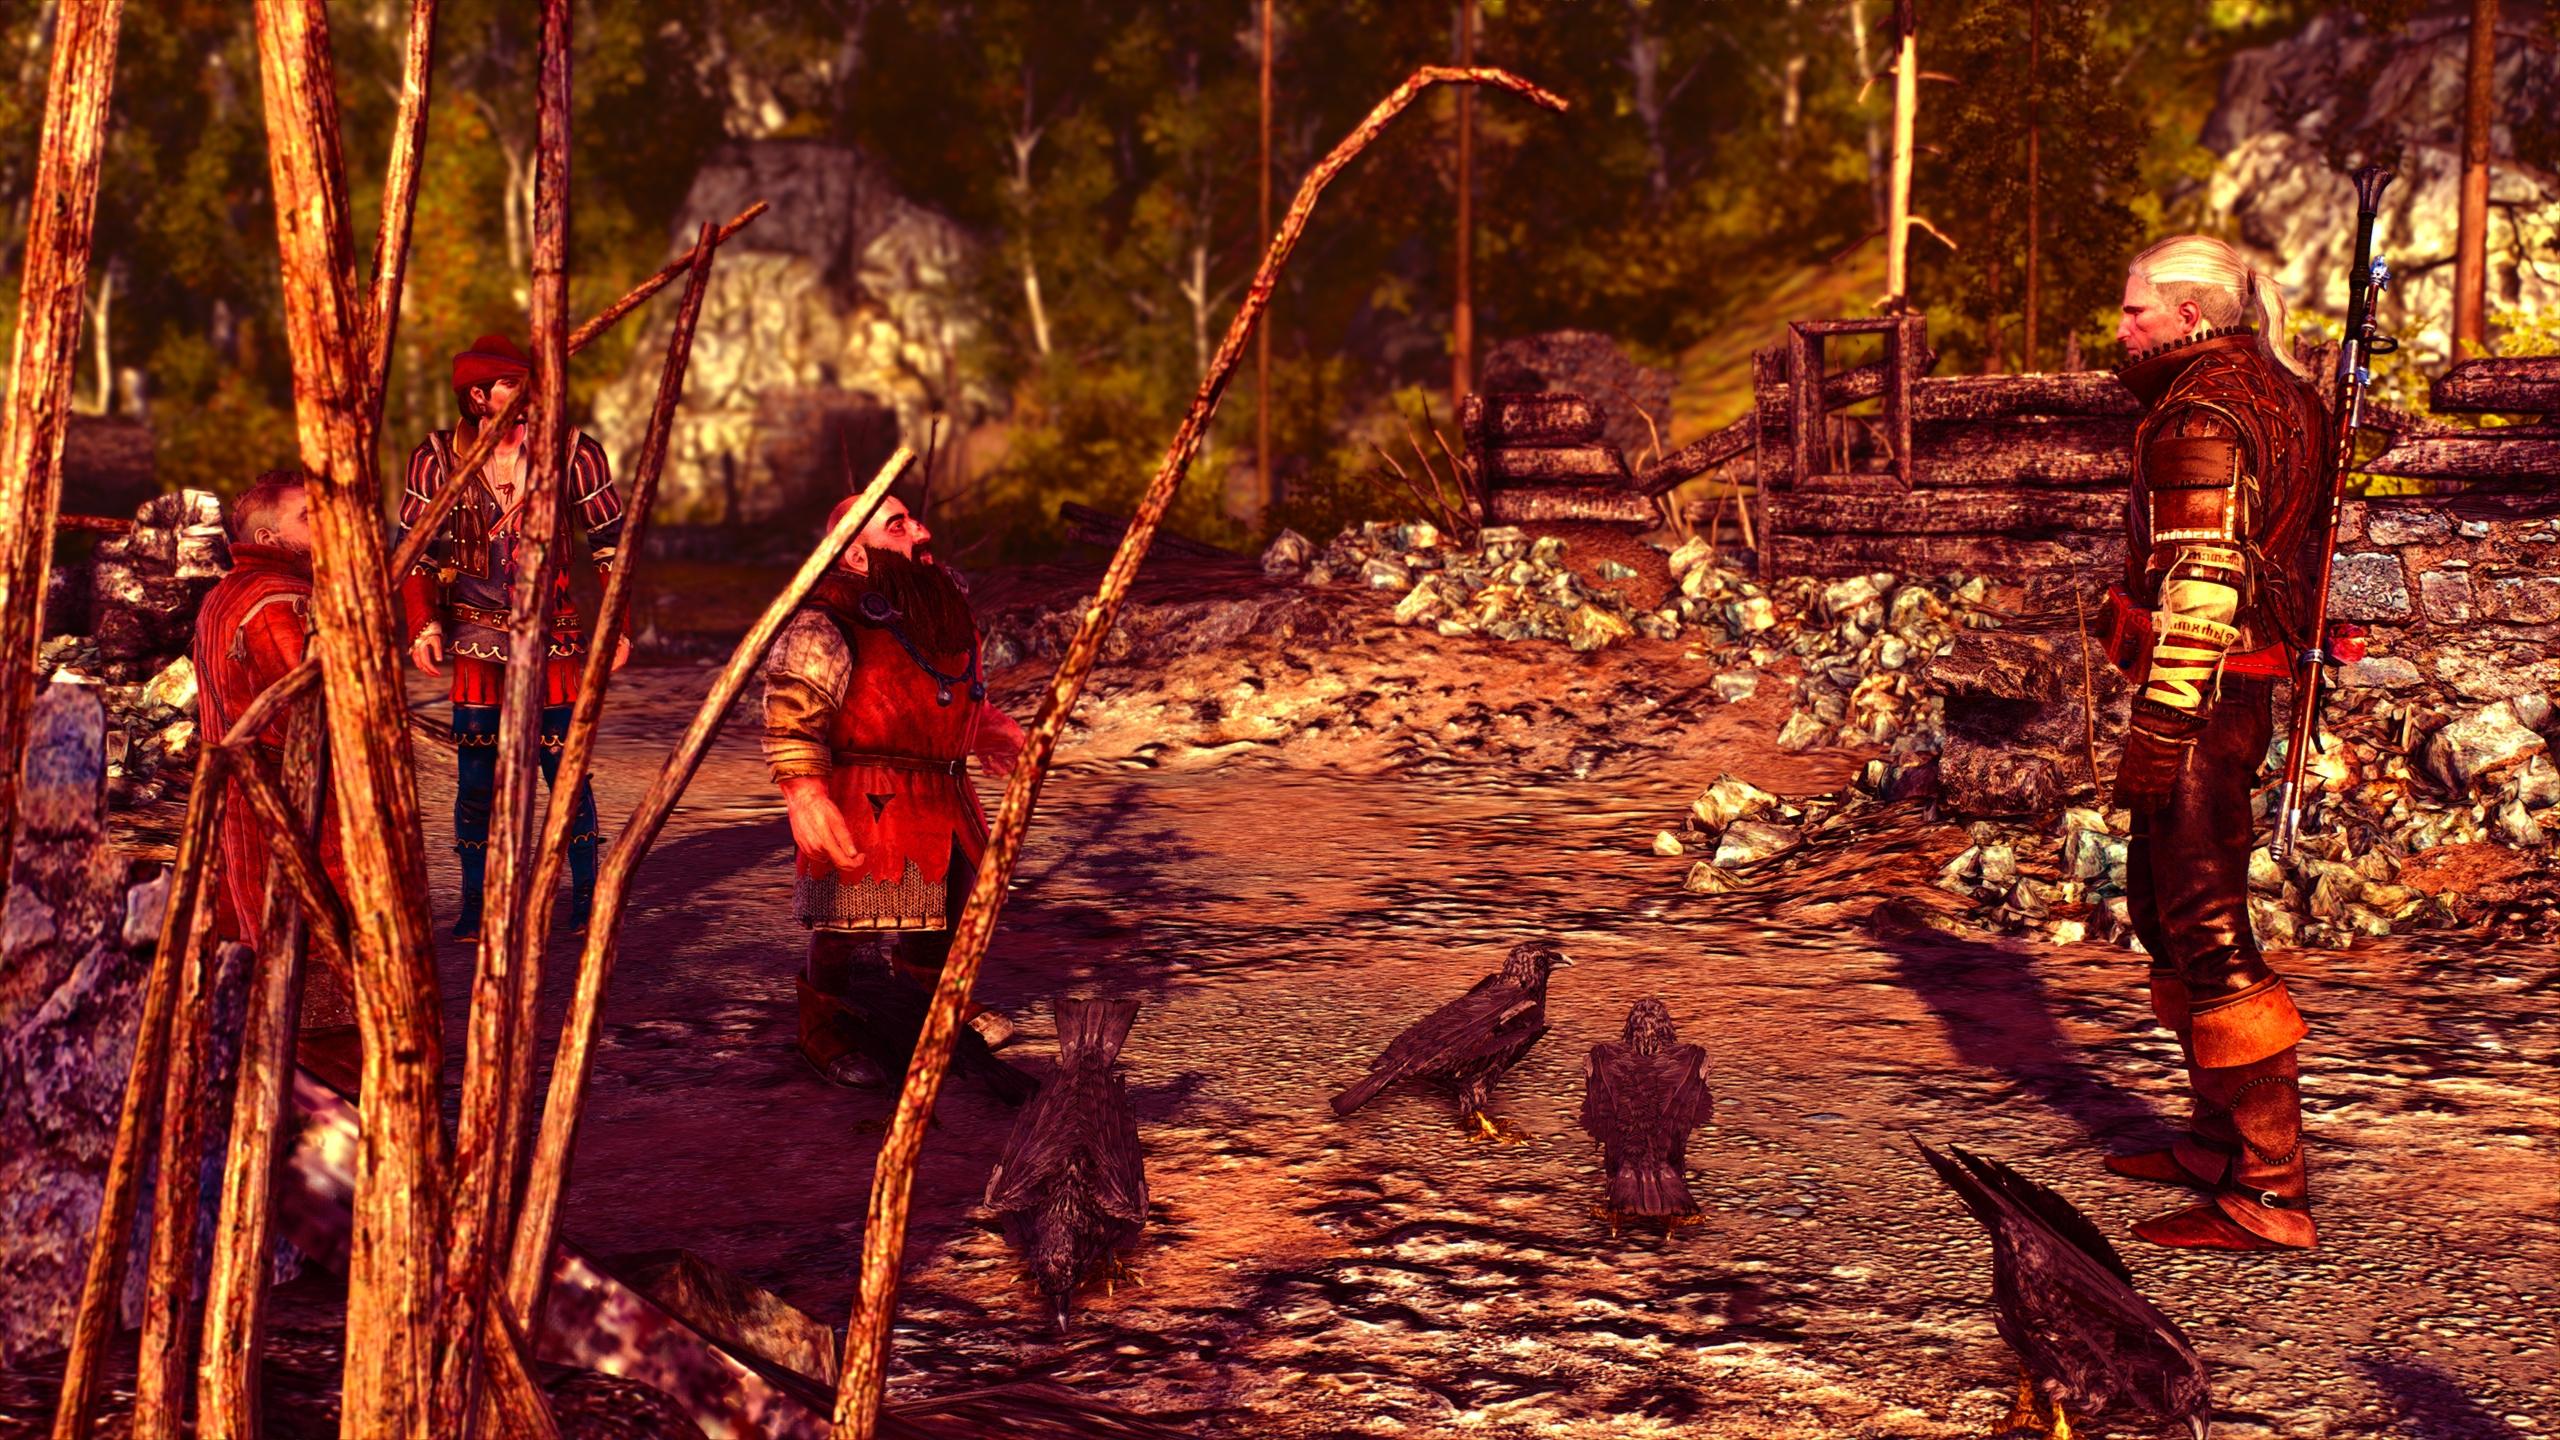 witcher22018-05-0812-diply.jpg